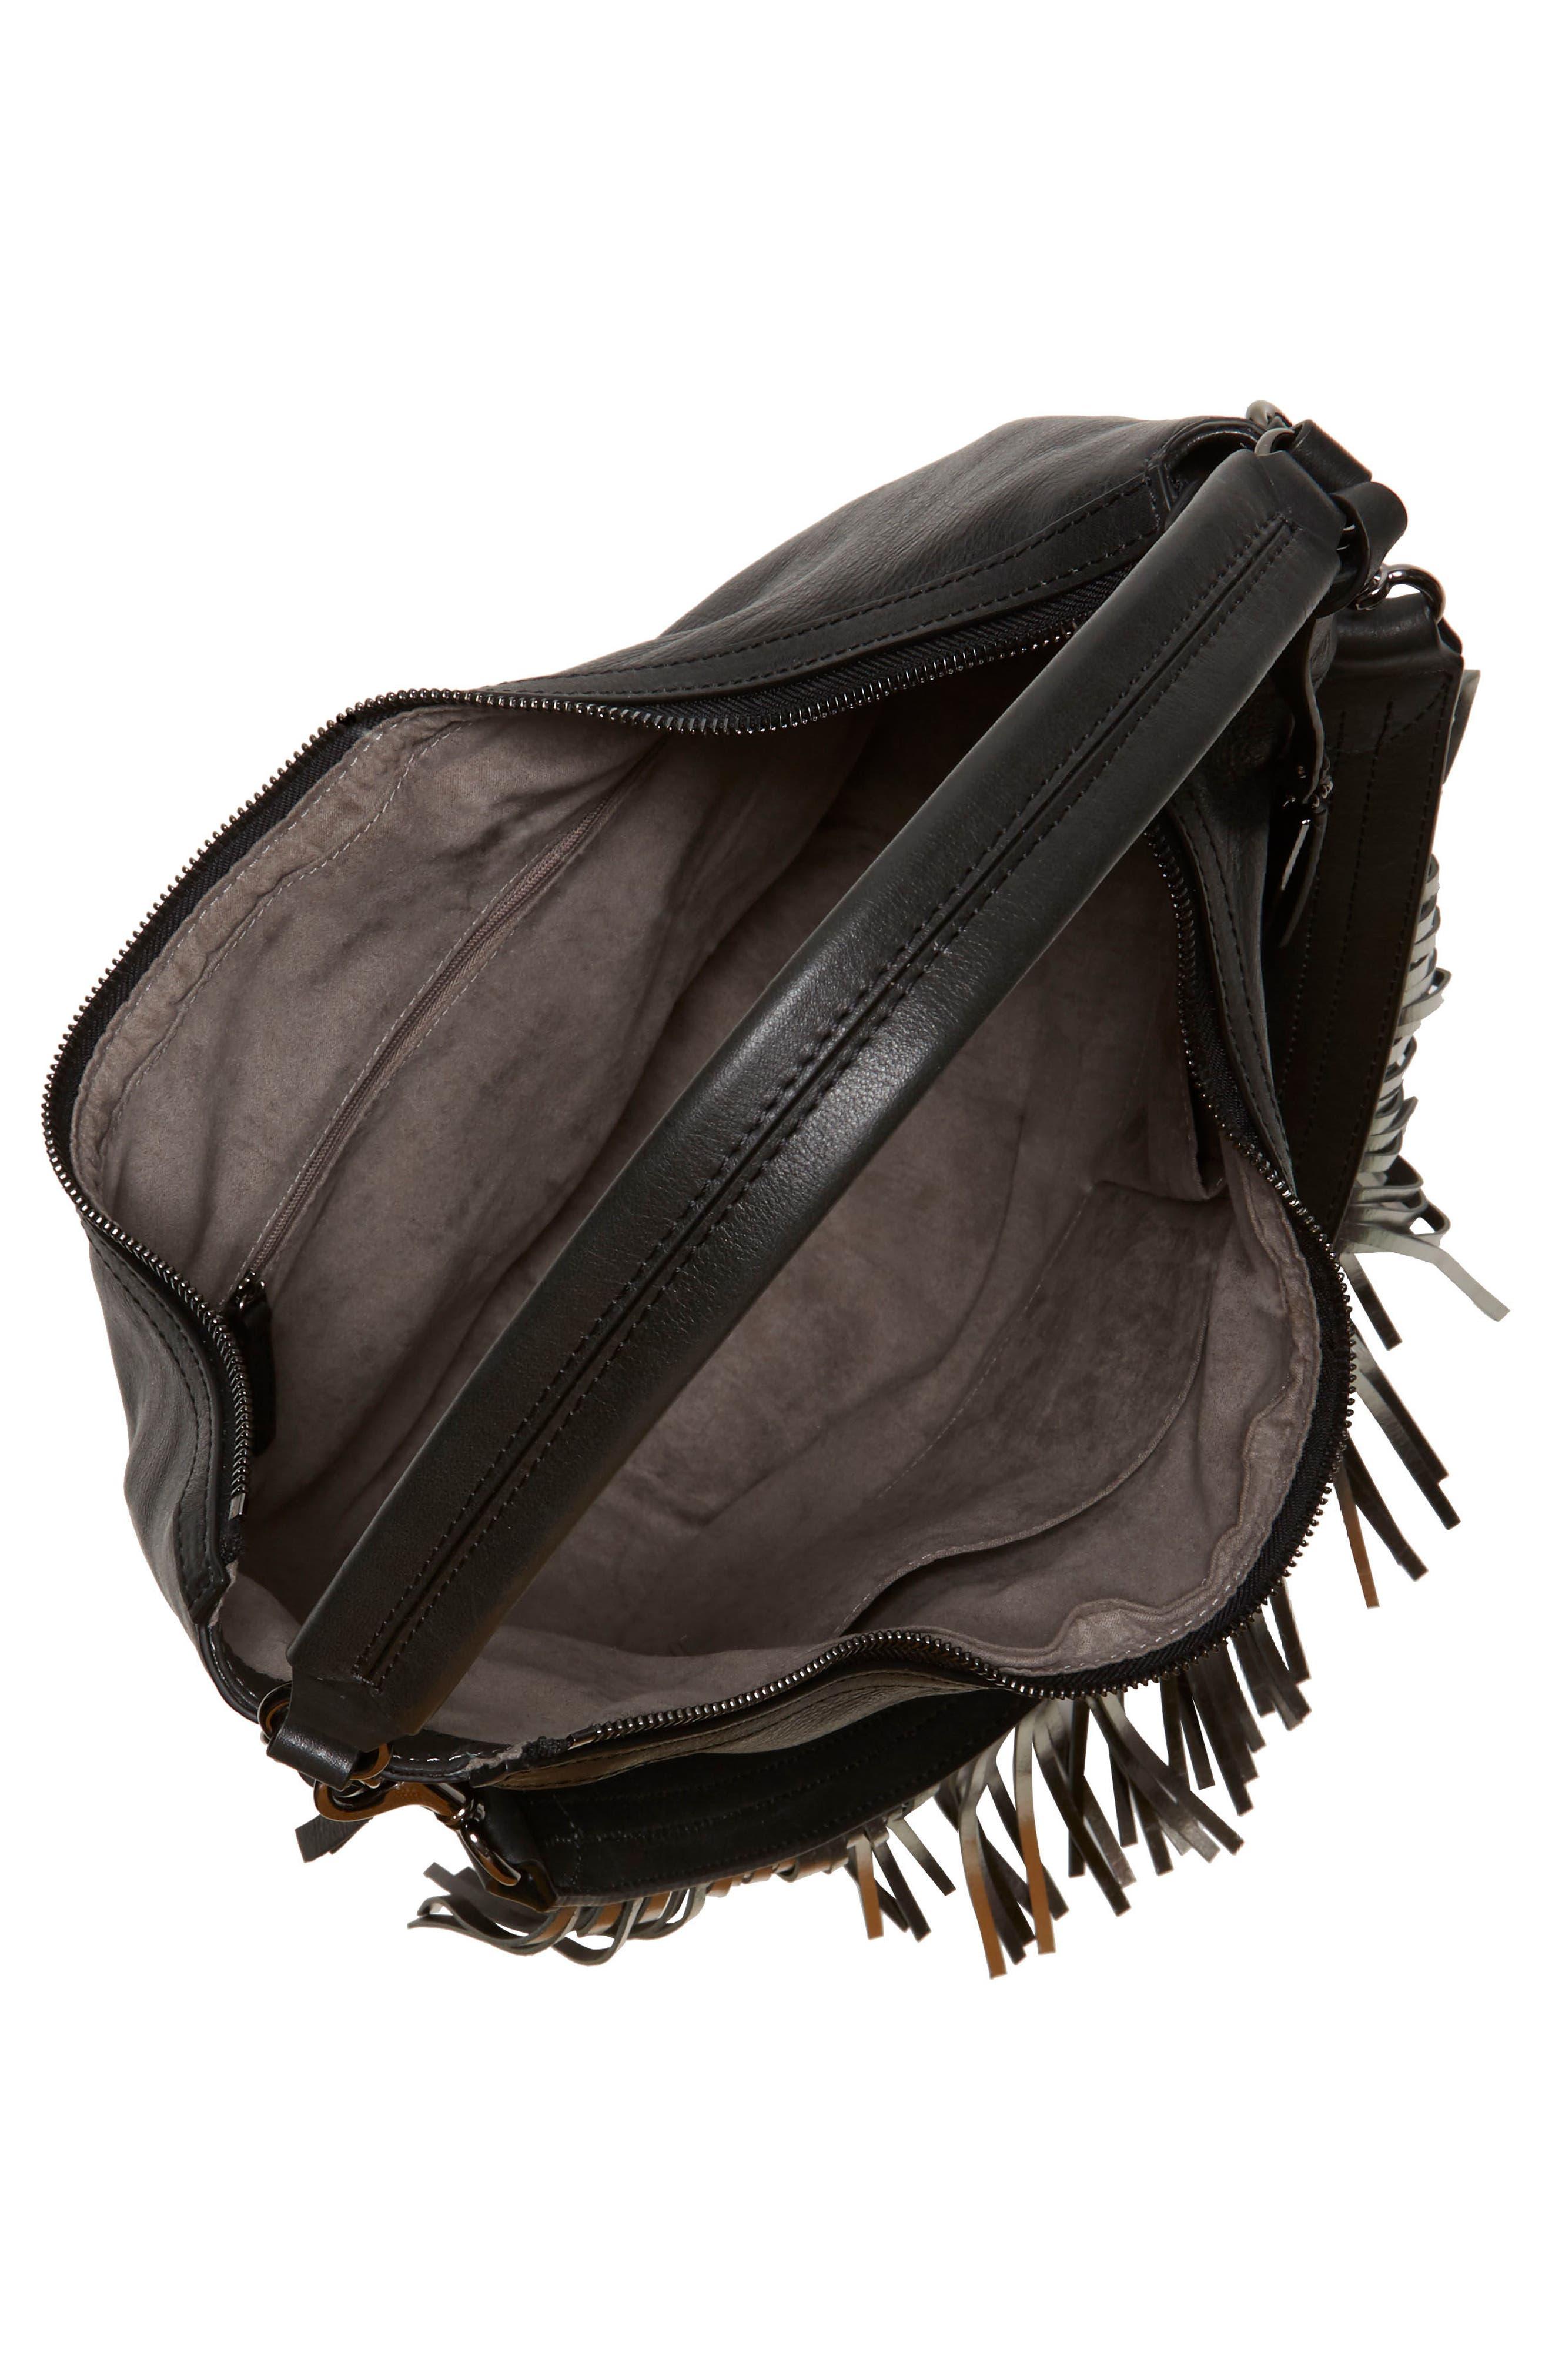 Hil Leather Hobo Bag,                             Alternate thumbnail 3, color,                             002